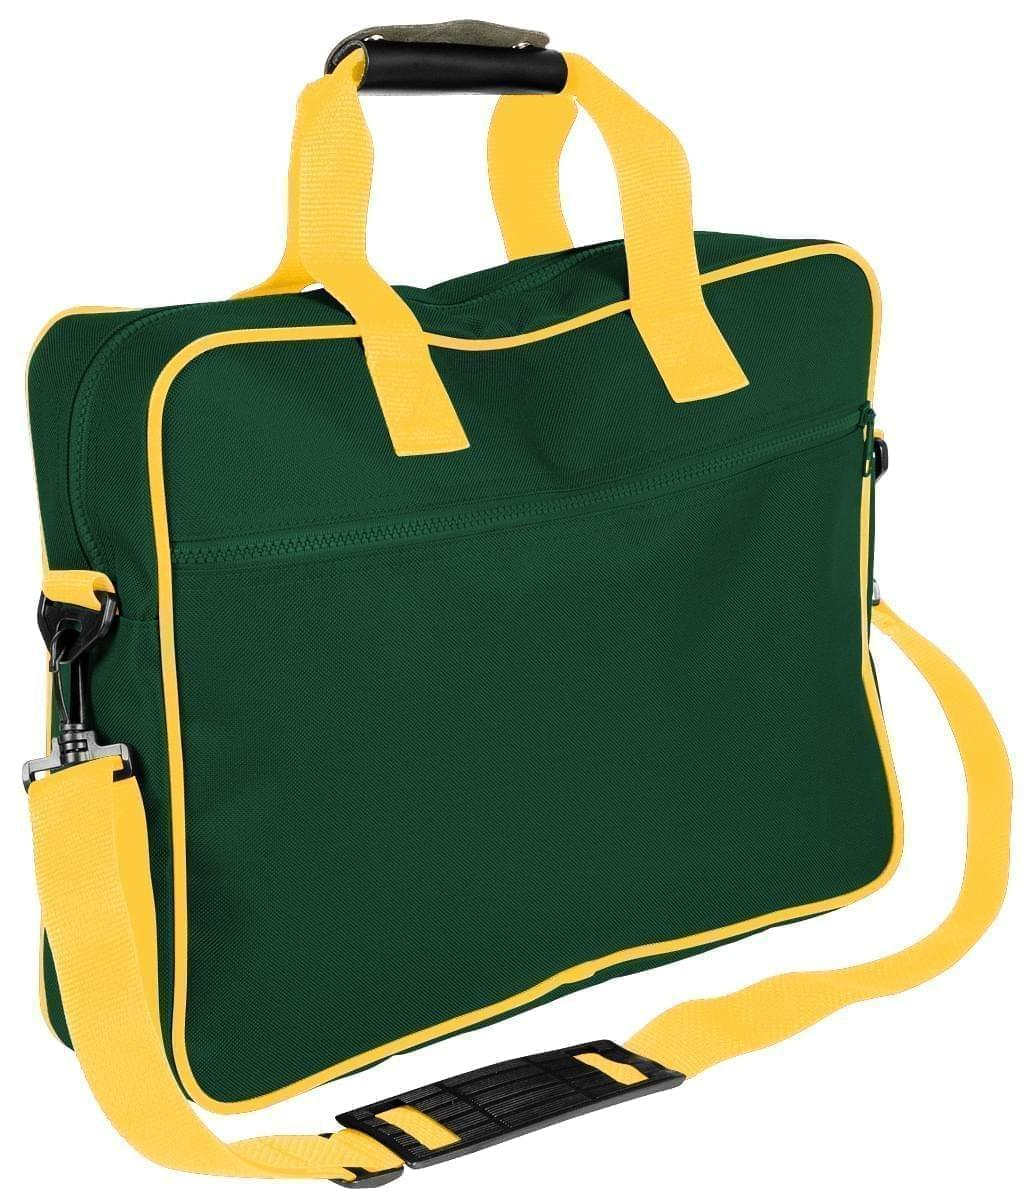 USA Made Nylon Poly Notebook Sleeves, Hunter Green-Gold, CPKVA59PS5